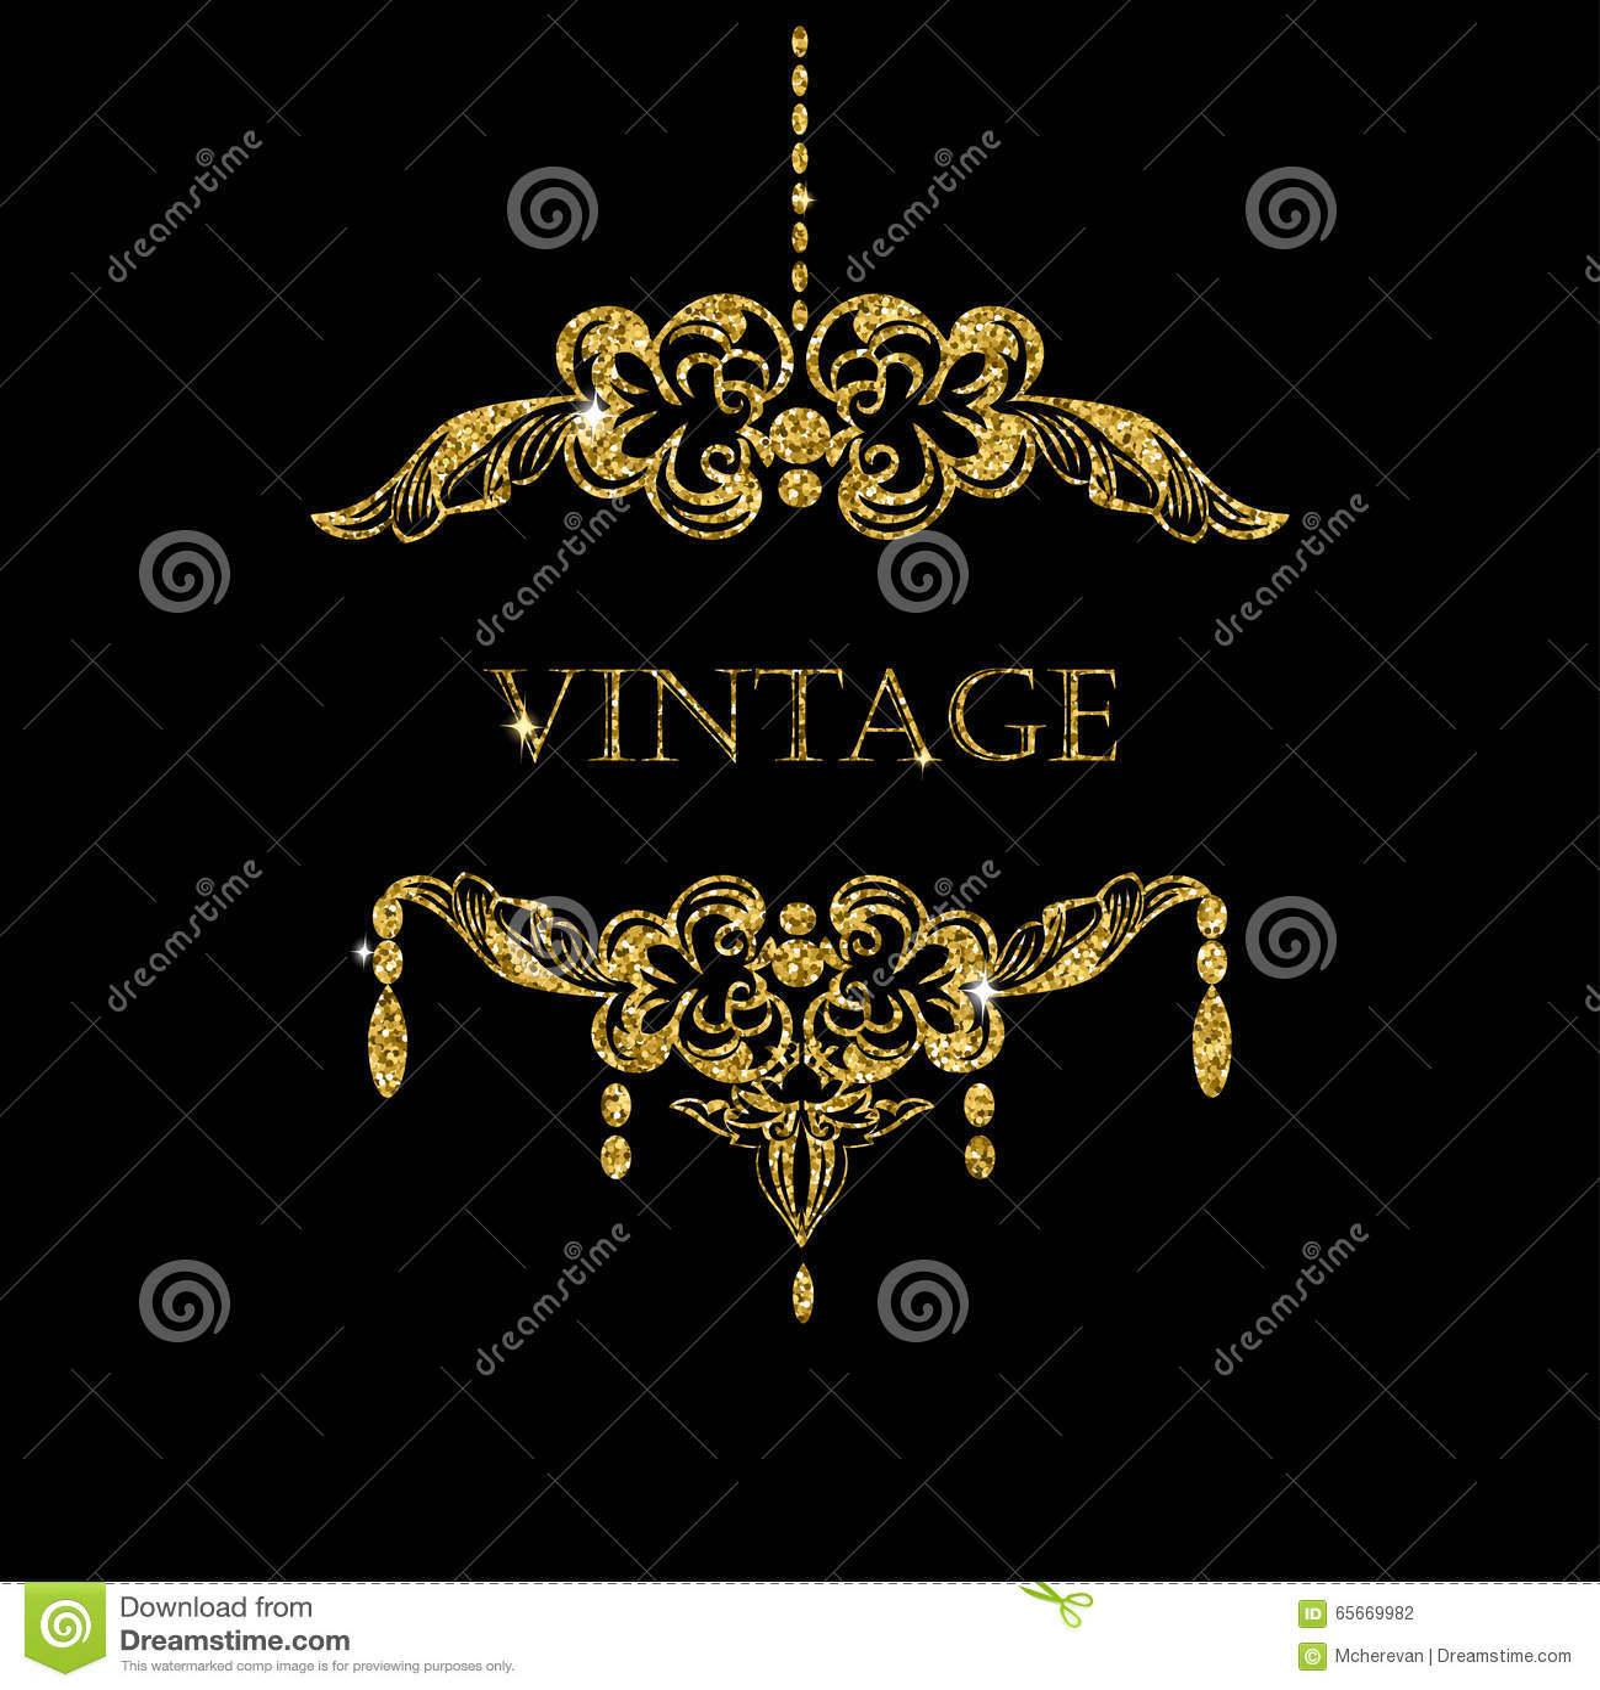 Black Chandelier Silhouette Logo Illustration Image 65669982 – Chandelier Logo